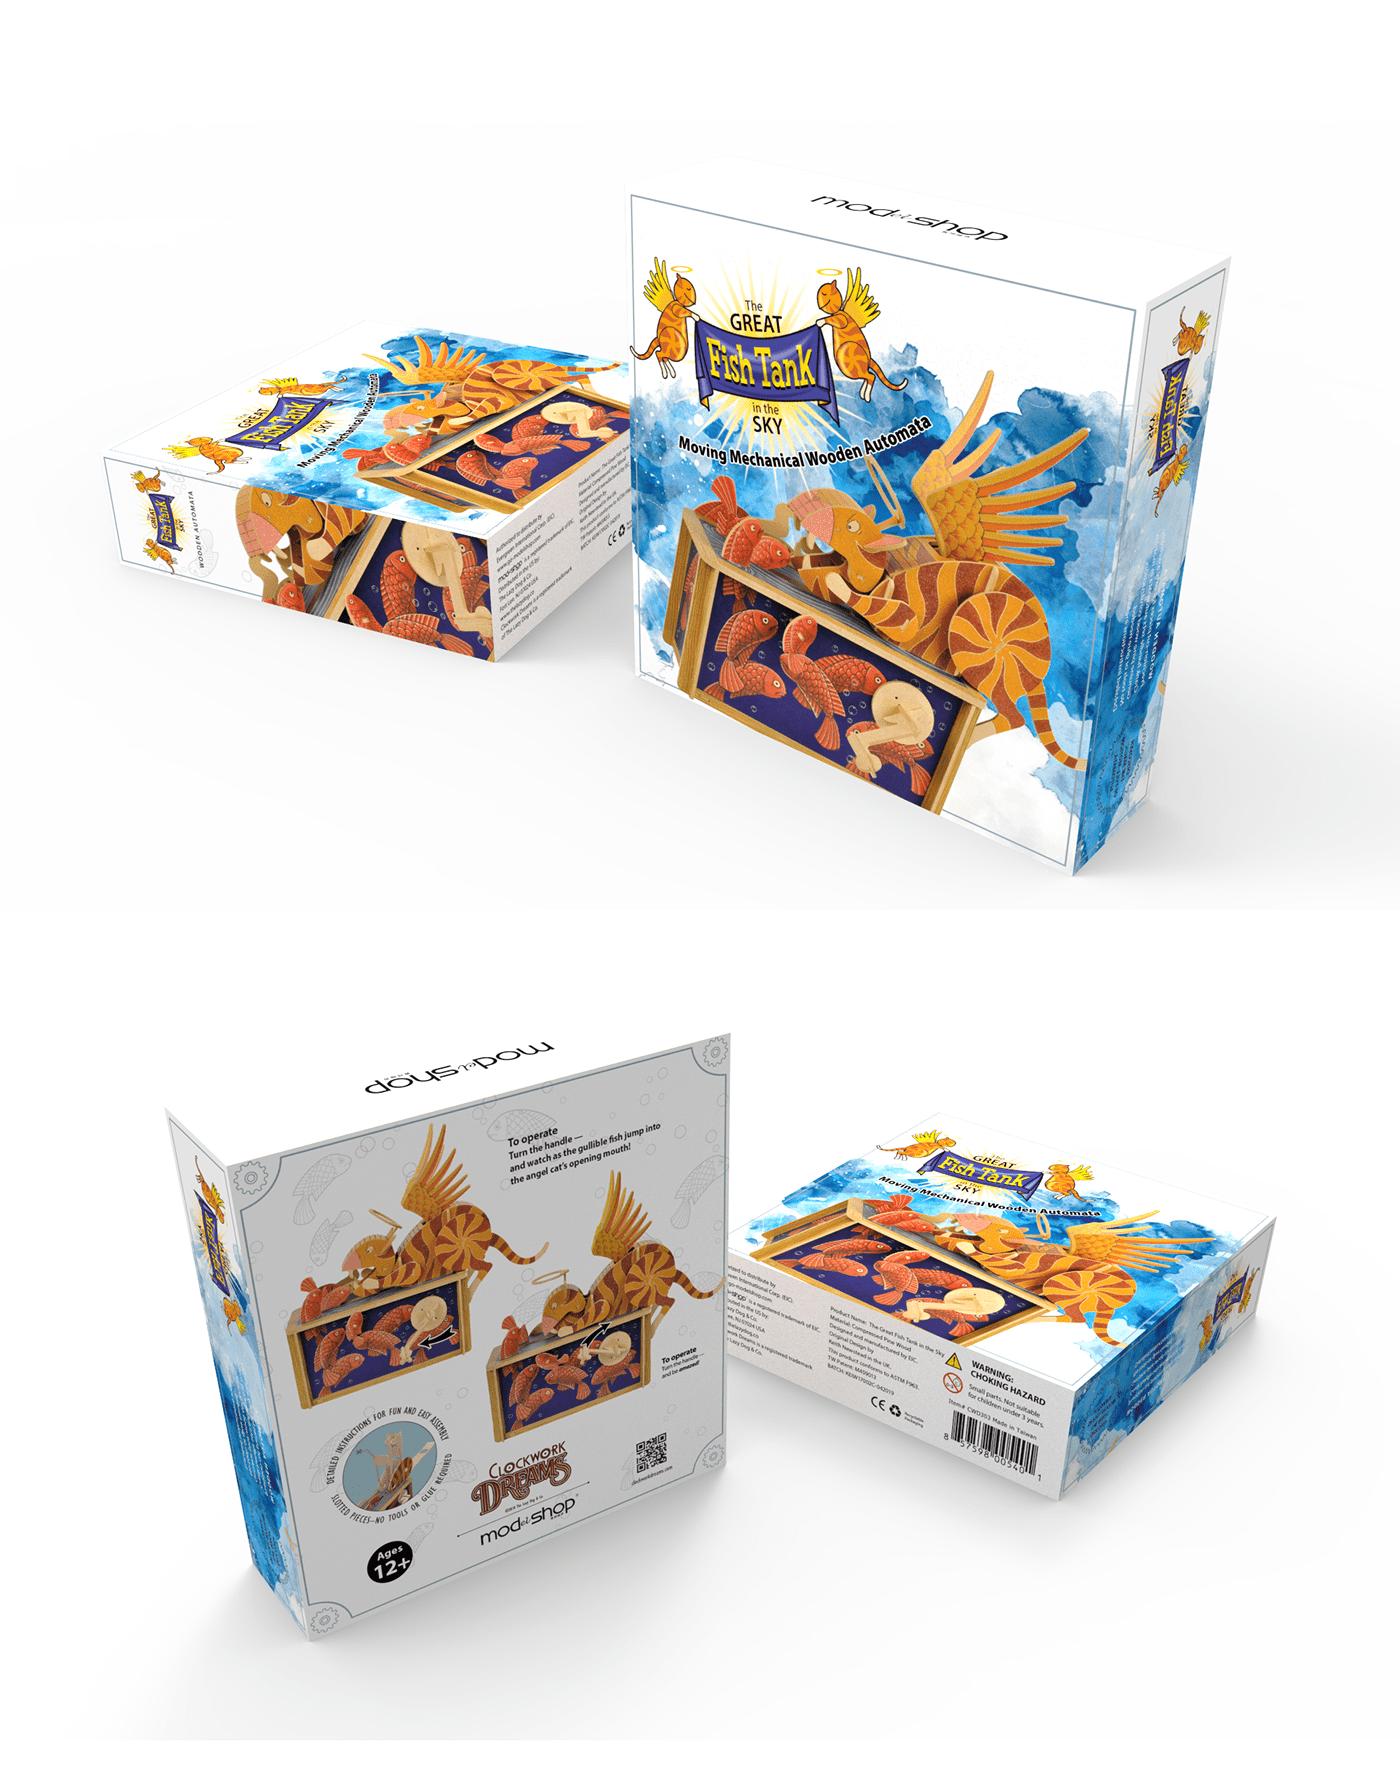 Image may contain: lego, cartoon and box